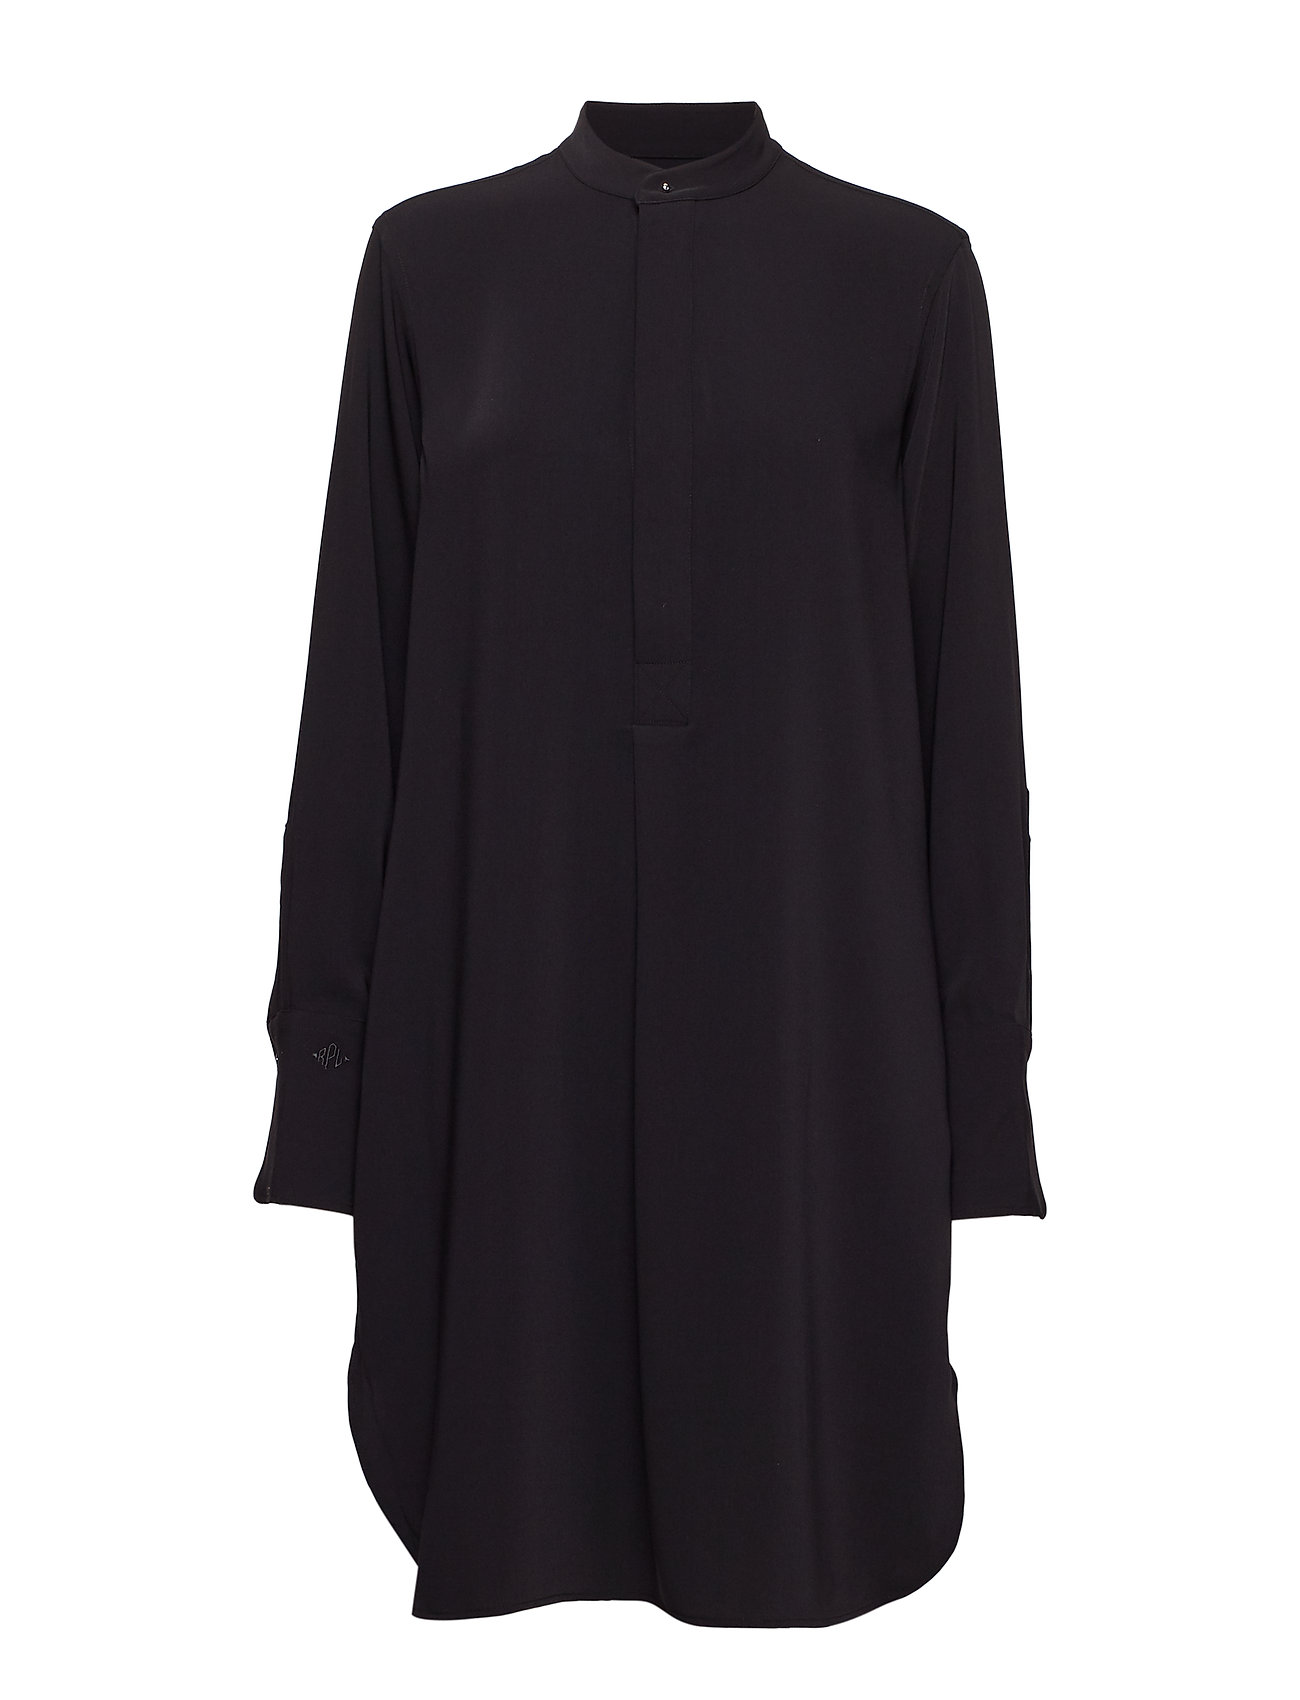 Polo Ralph Lauren Crepe Shirtdress